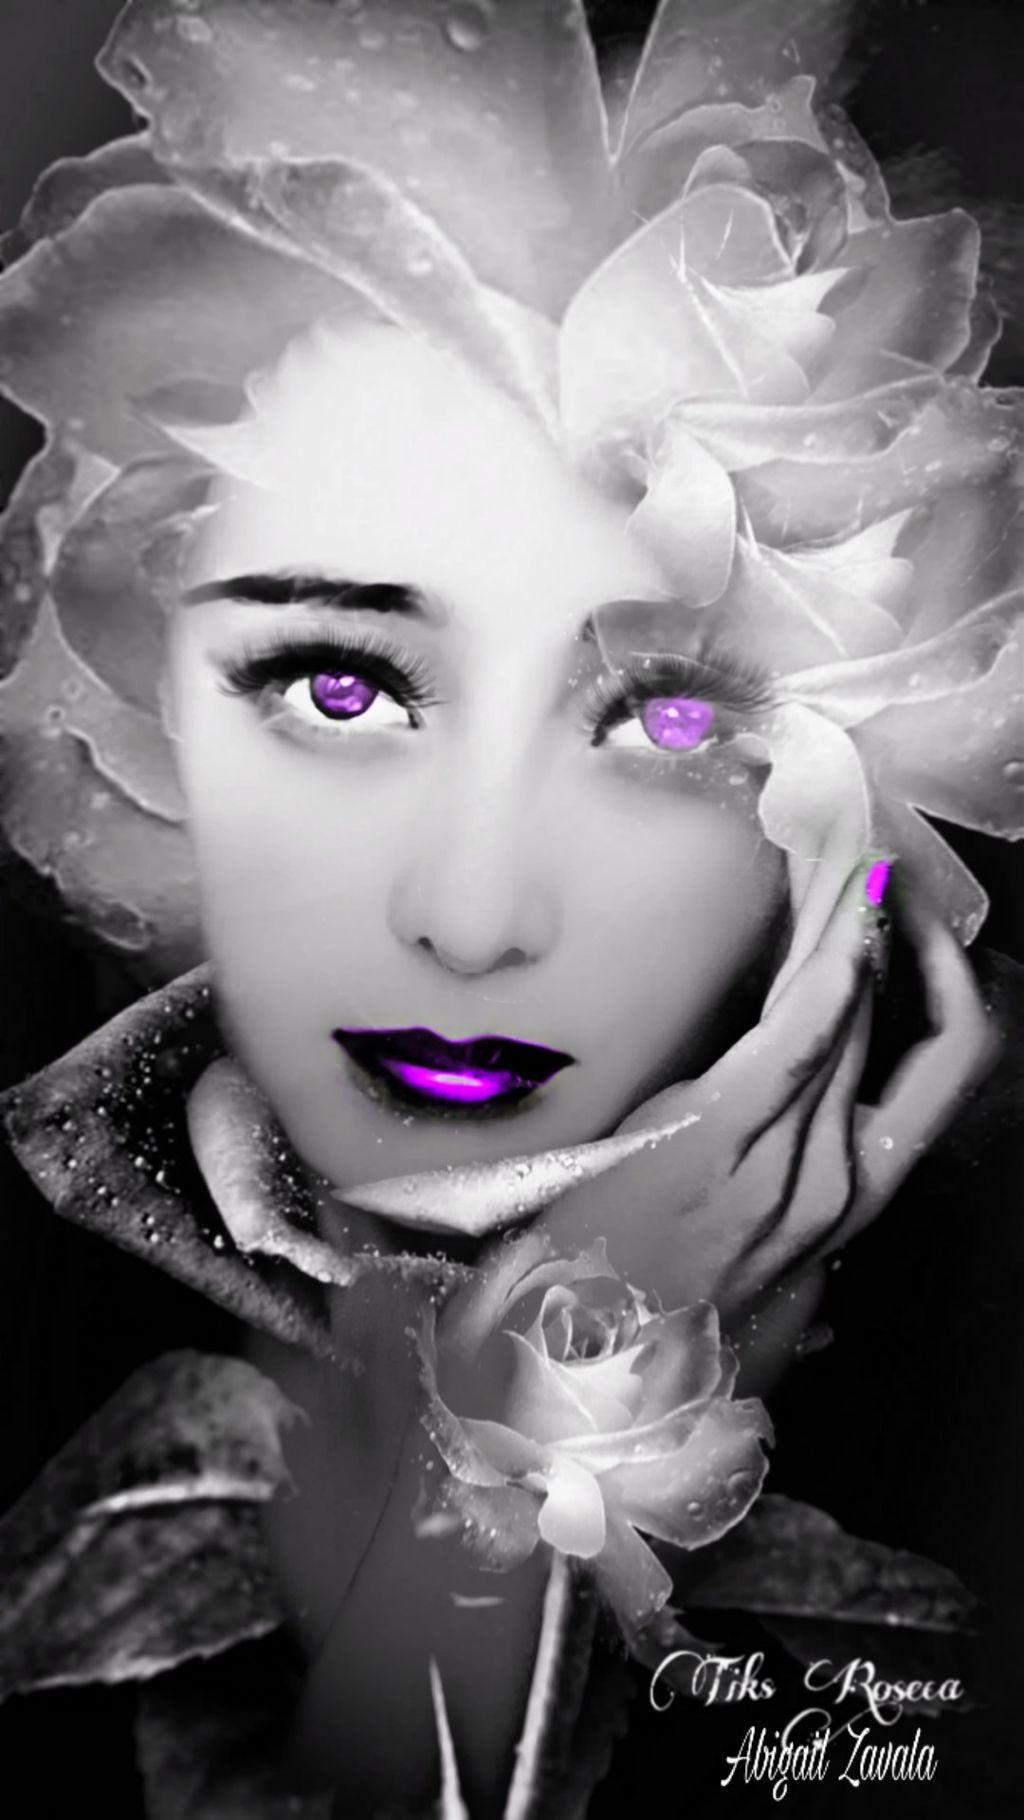 @tiks-roseca #freetoedit #remixed#blackandwhite #doublexposure #fantasy#undefined